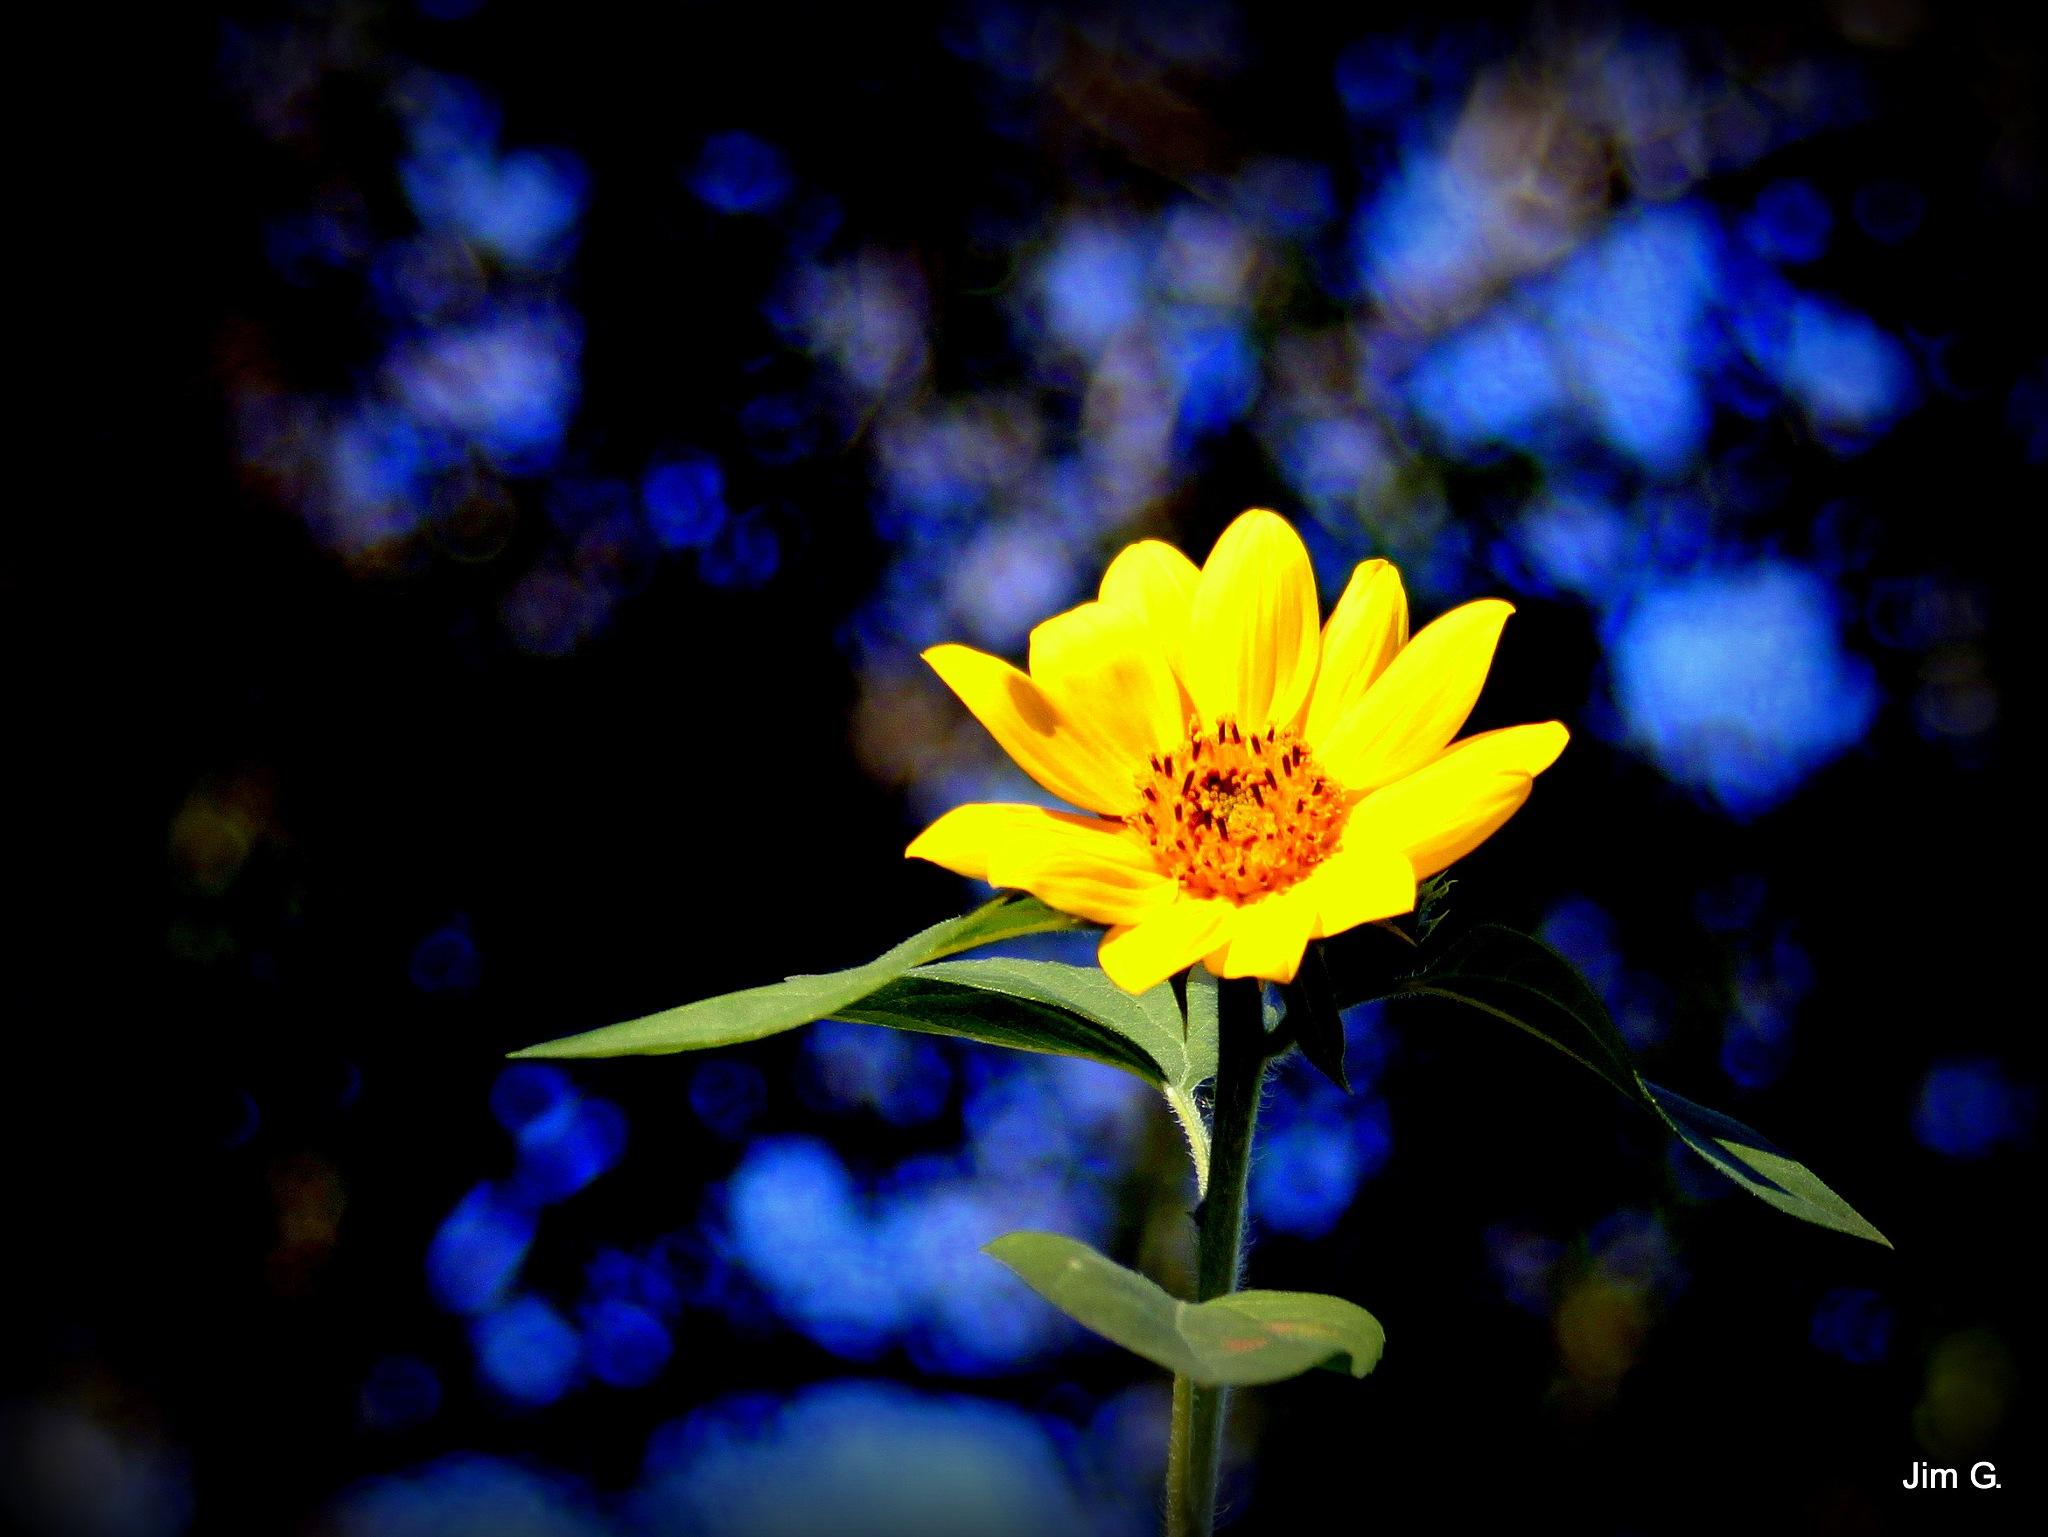 Sunflower in bright sunlight by Jim Graham